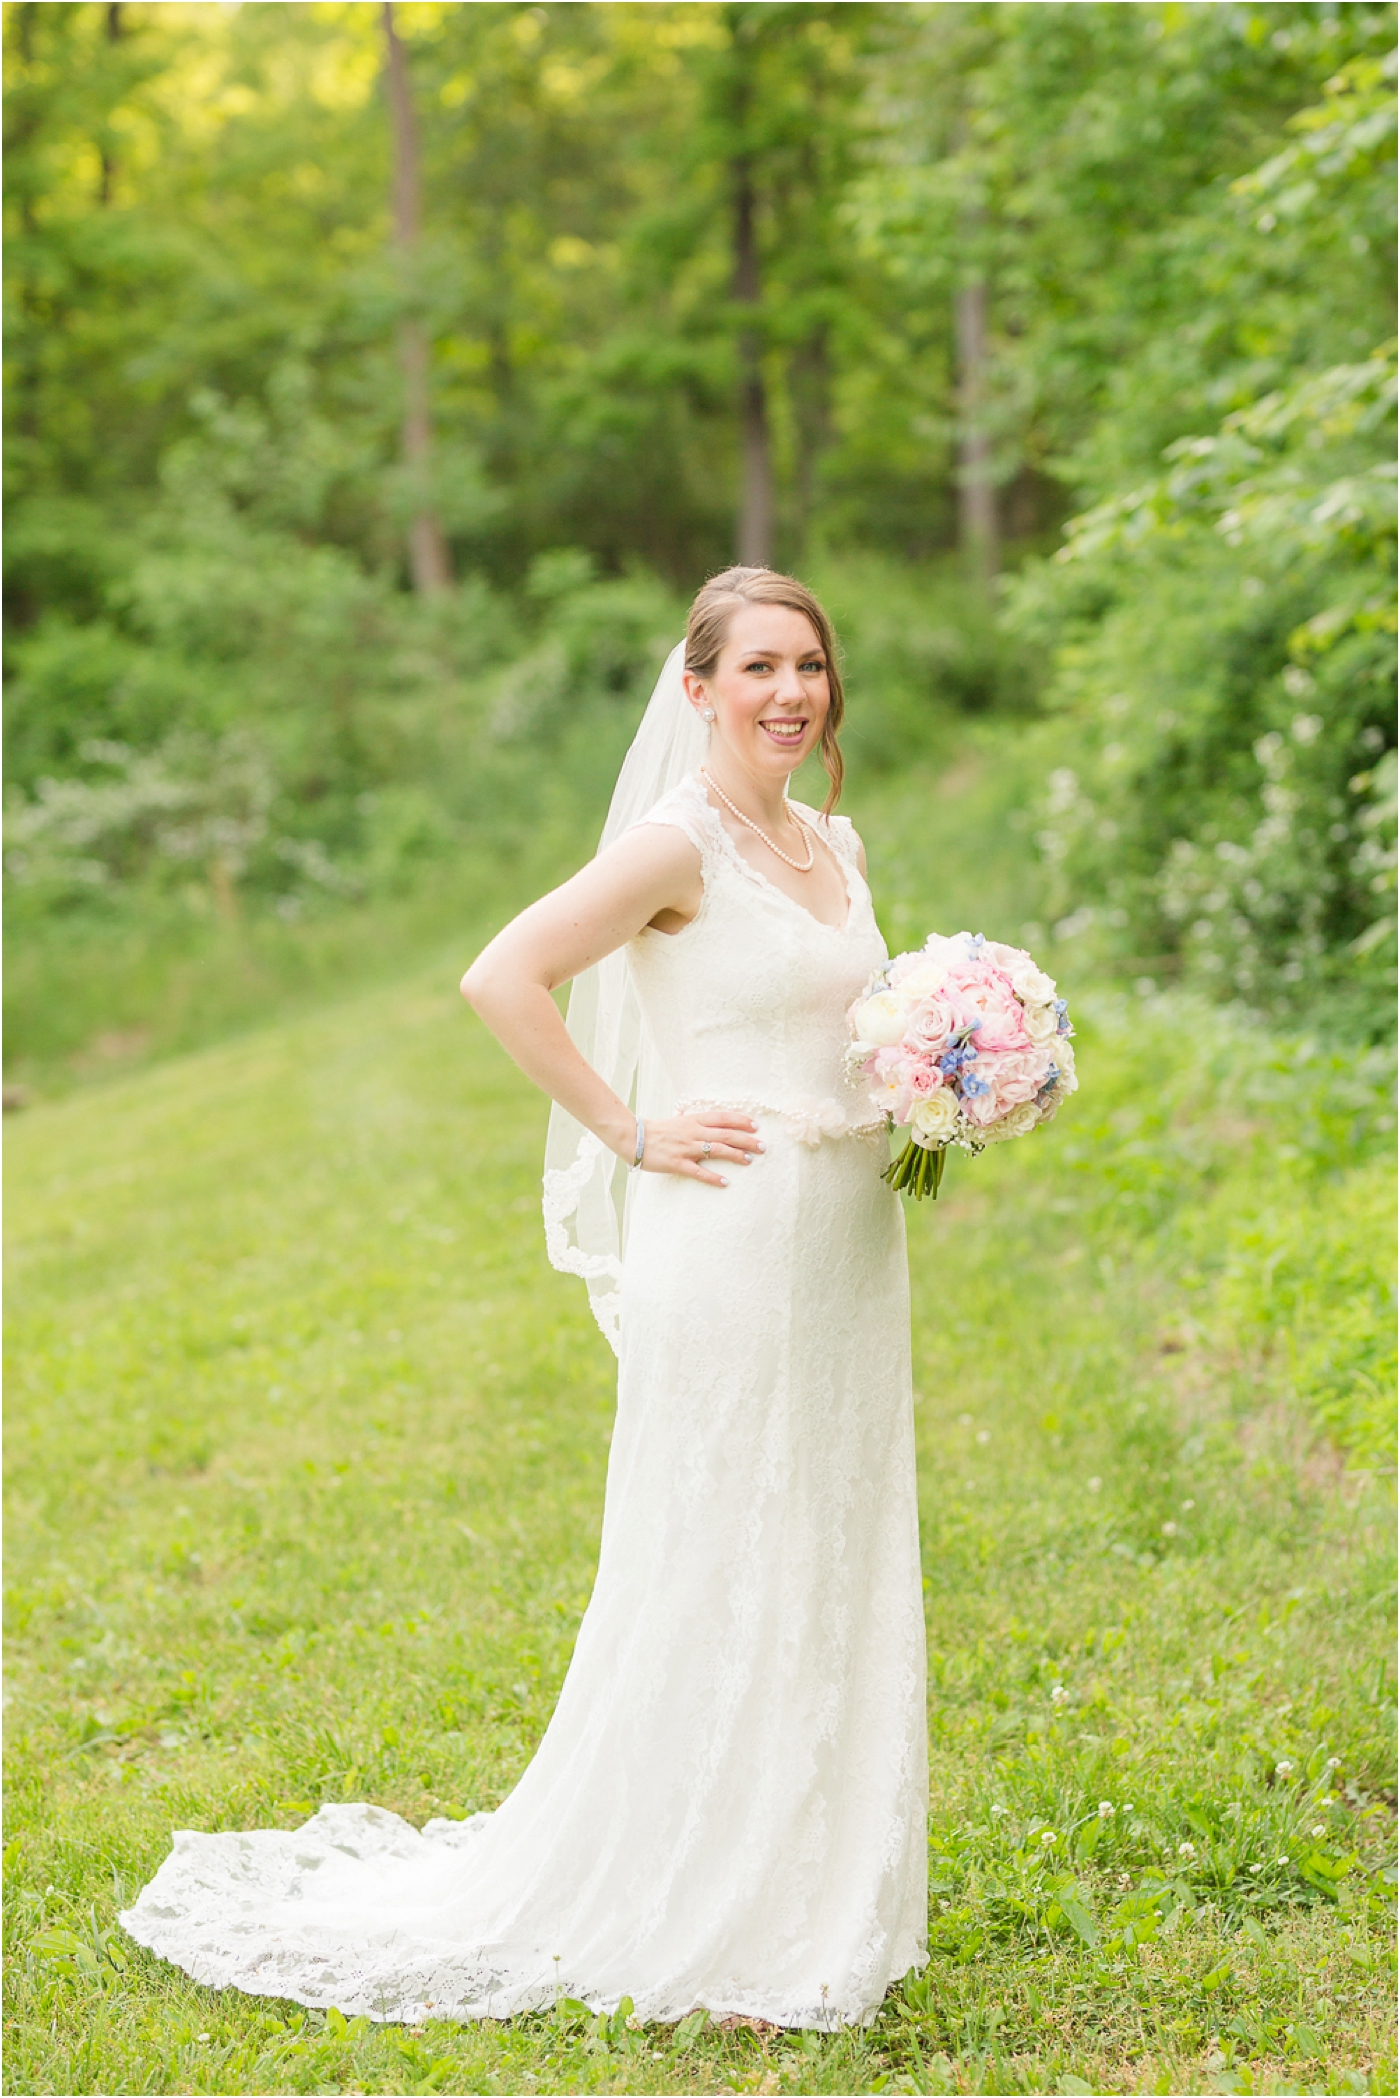 Gettysburg-lodges-wedding-photos-78.jpg